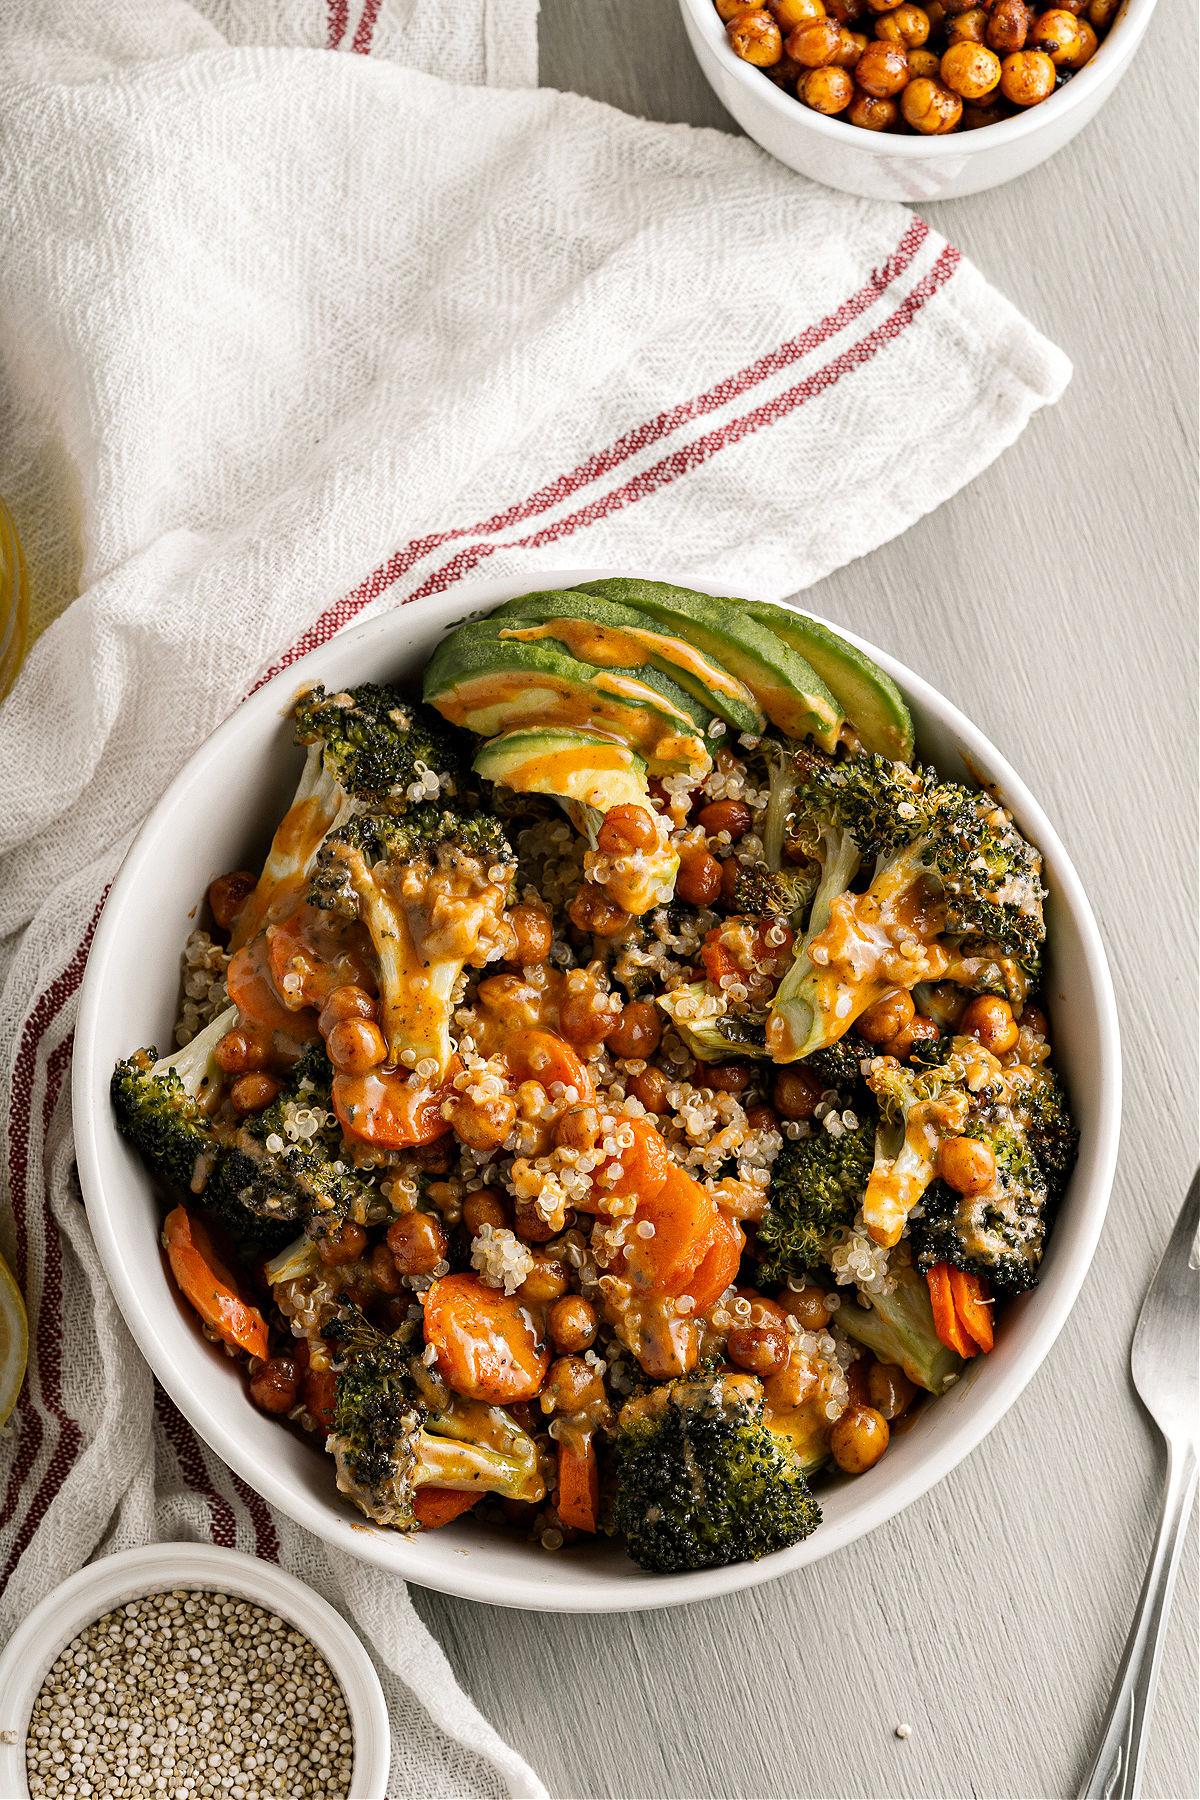 Broccoli buddha bowl with quinoa in a serving dish.